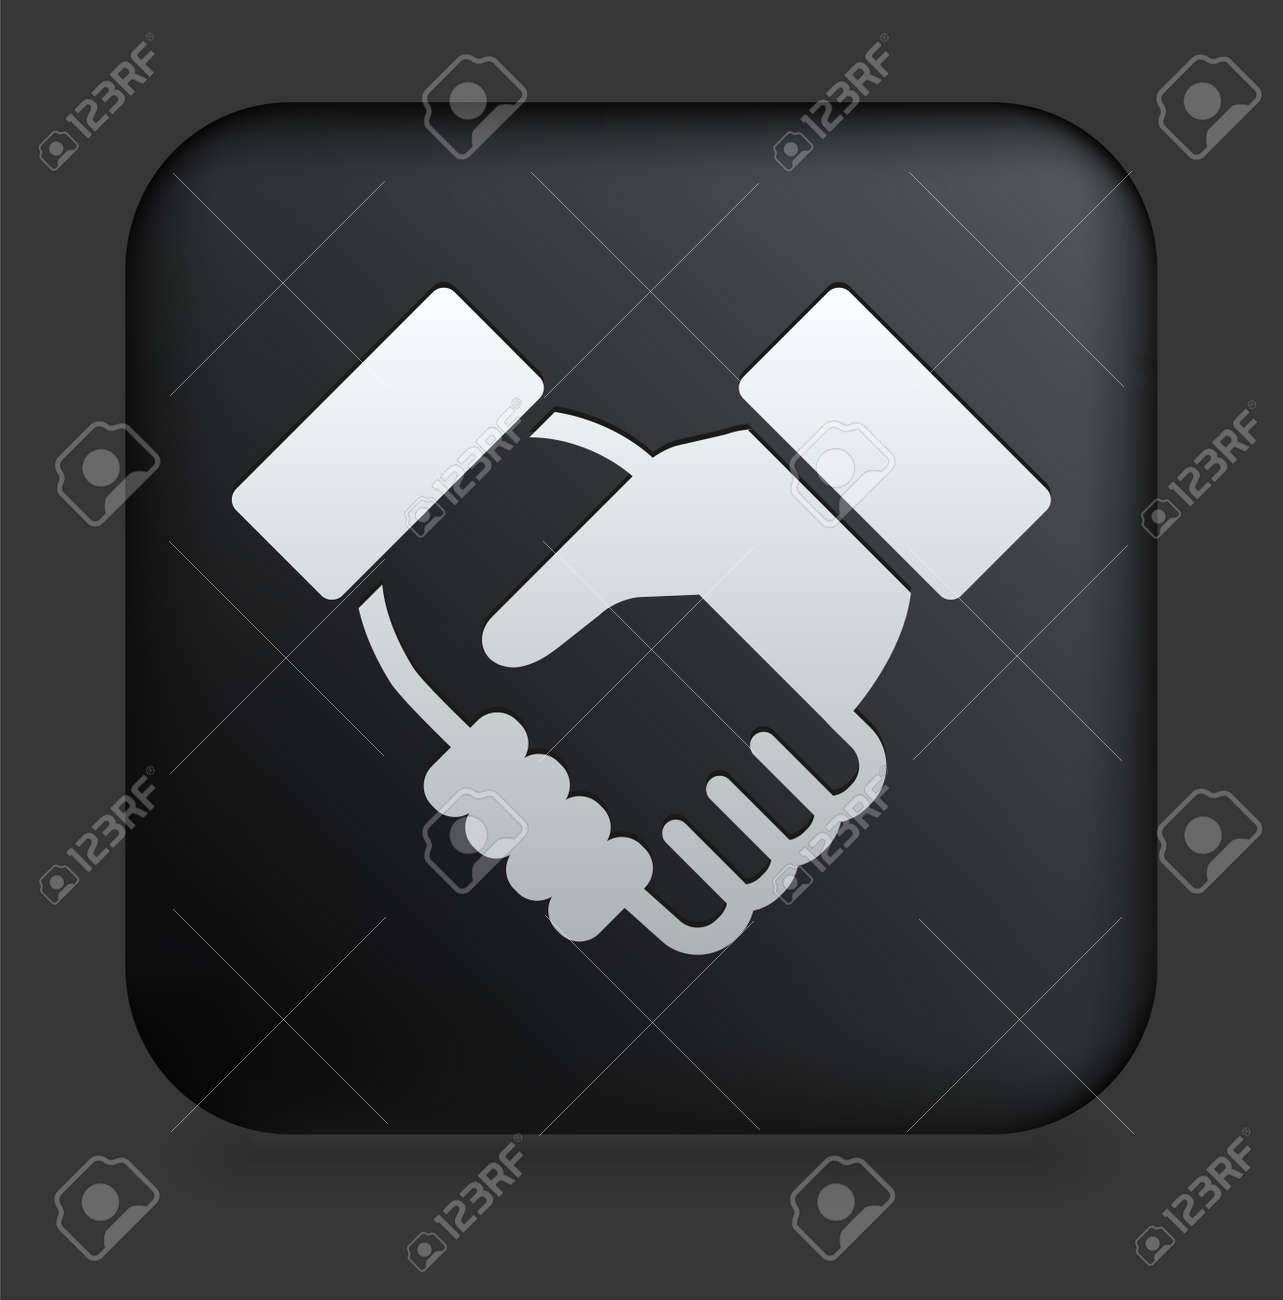 Handshake Icon on Square Black Internet ButtonOriginal Illustration Stock Illustration - 7567942